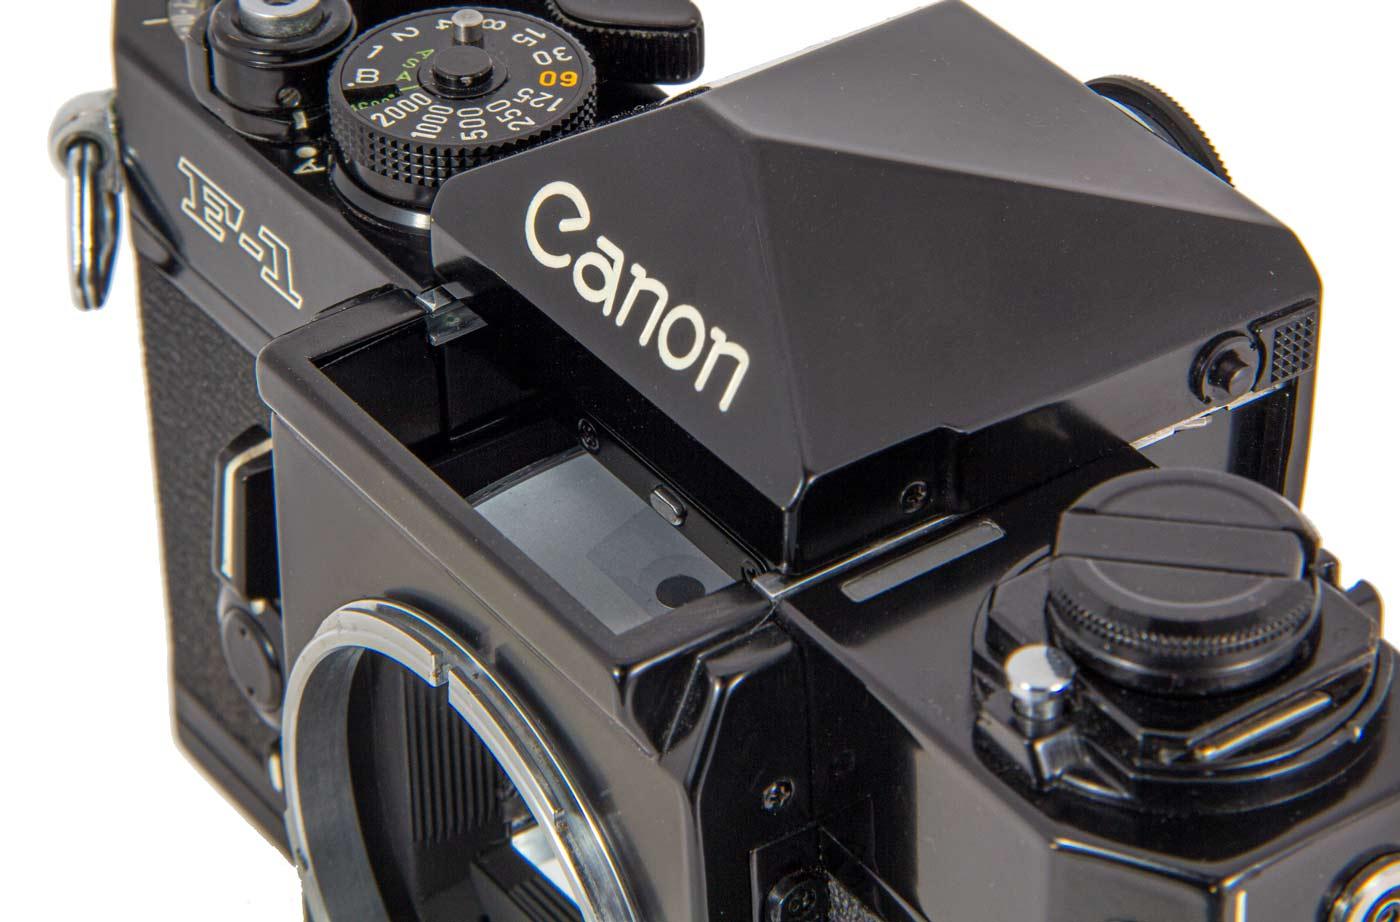 Canon F-1 Eye Level Finder